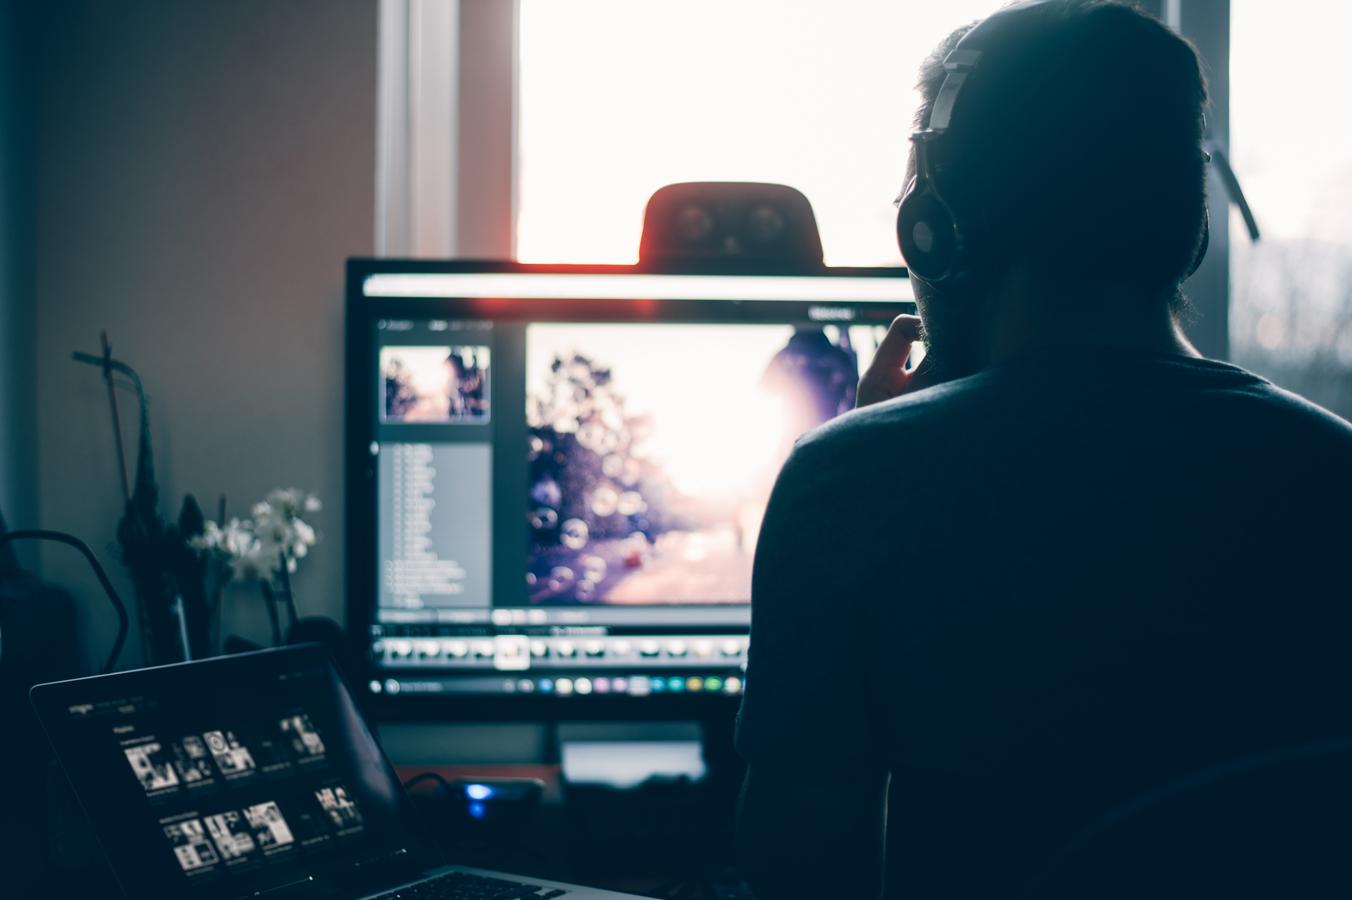 Photournalism Degree - Editing Photos